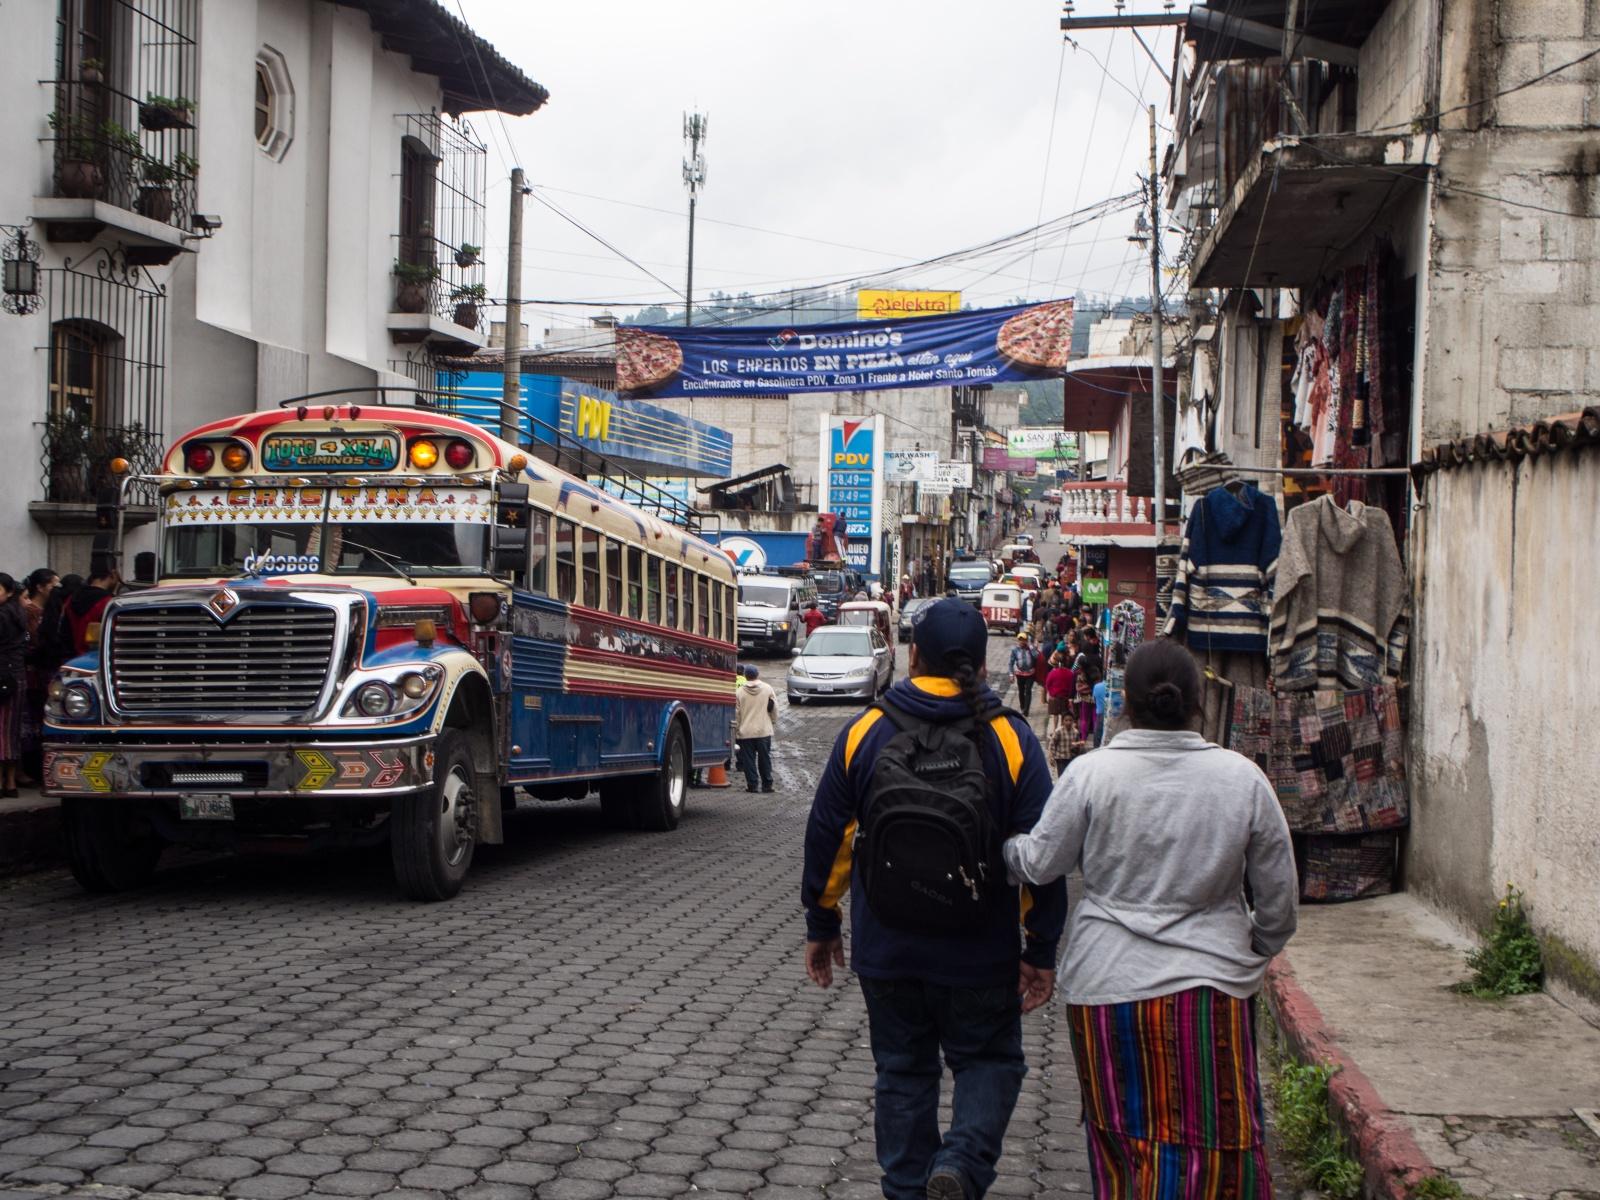 CHICHICASTENANGO, GUATEMALA - AUGUST 2018